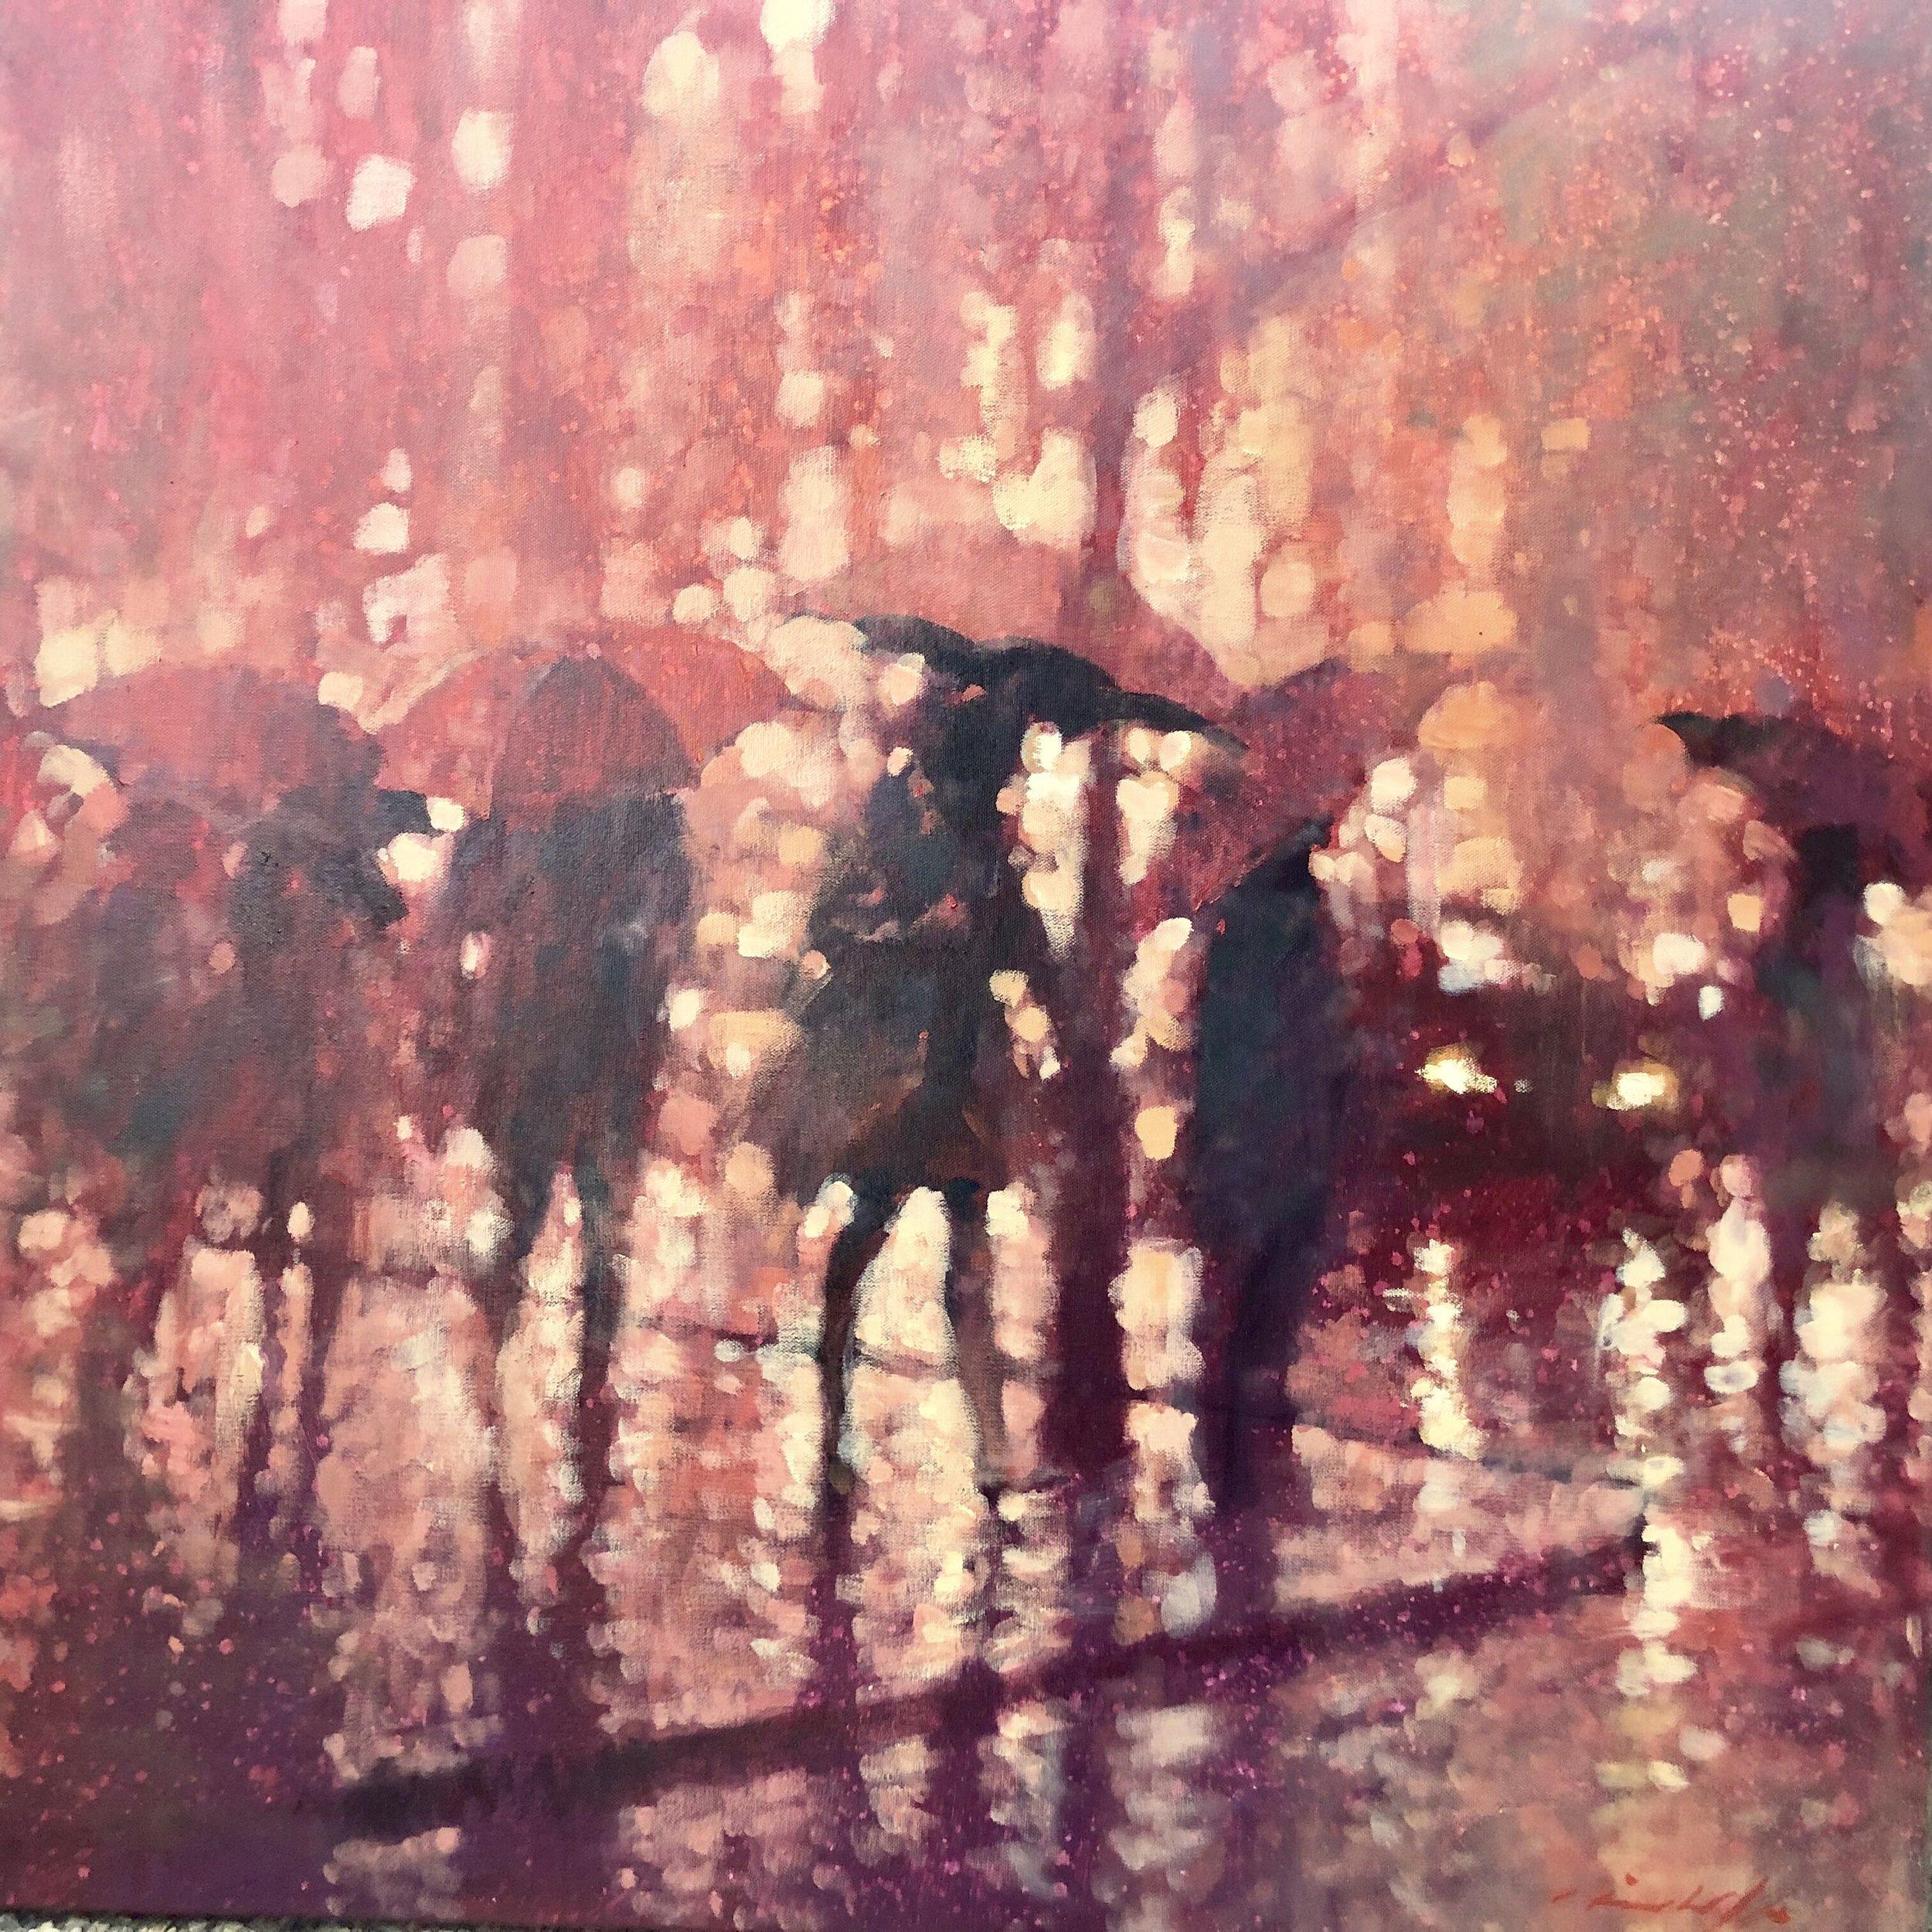 David Hinchliffe, Uptown Girl, Acrylic and oil on canvas, 91x91cm